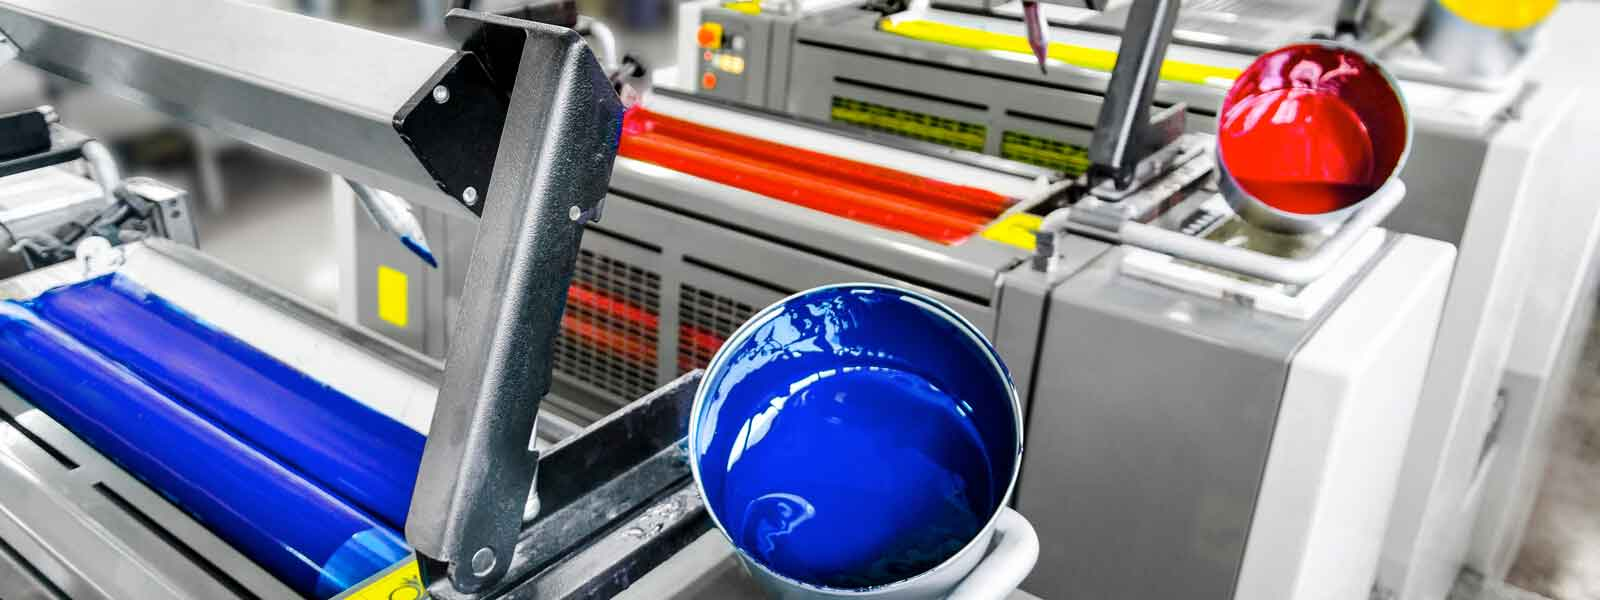 printers services gold coast image 1